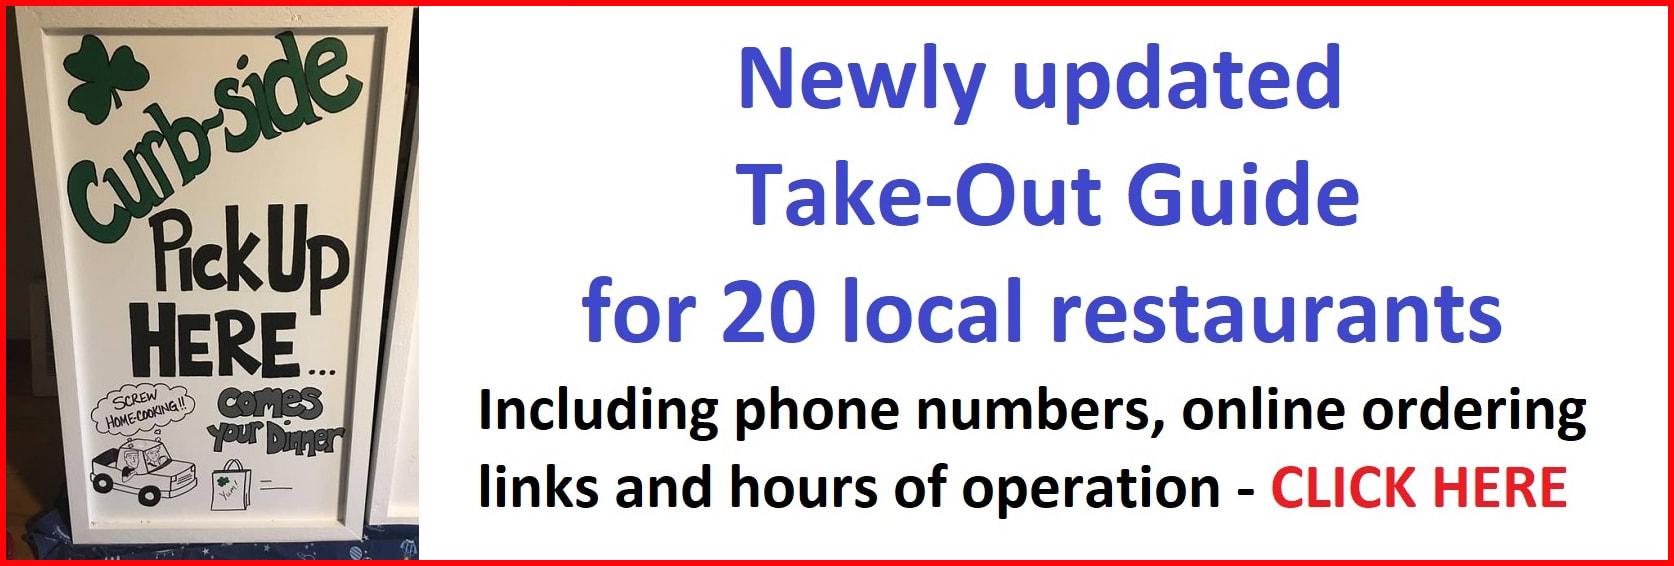 take-out-guide-banner-slider-w1674.jpg